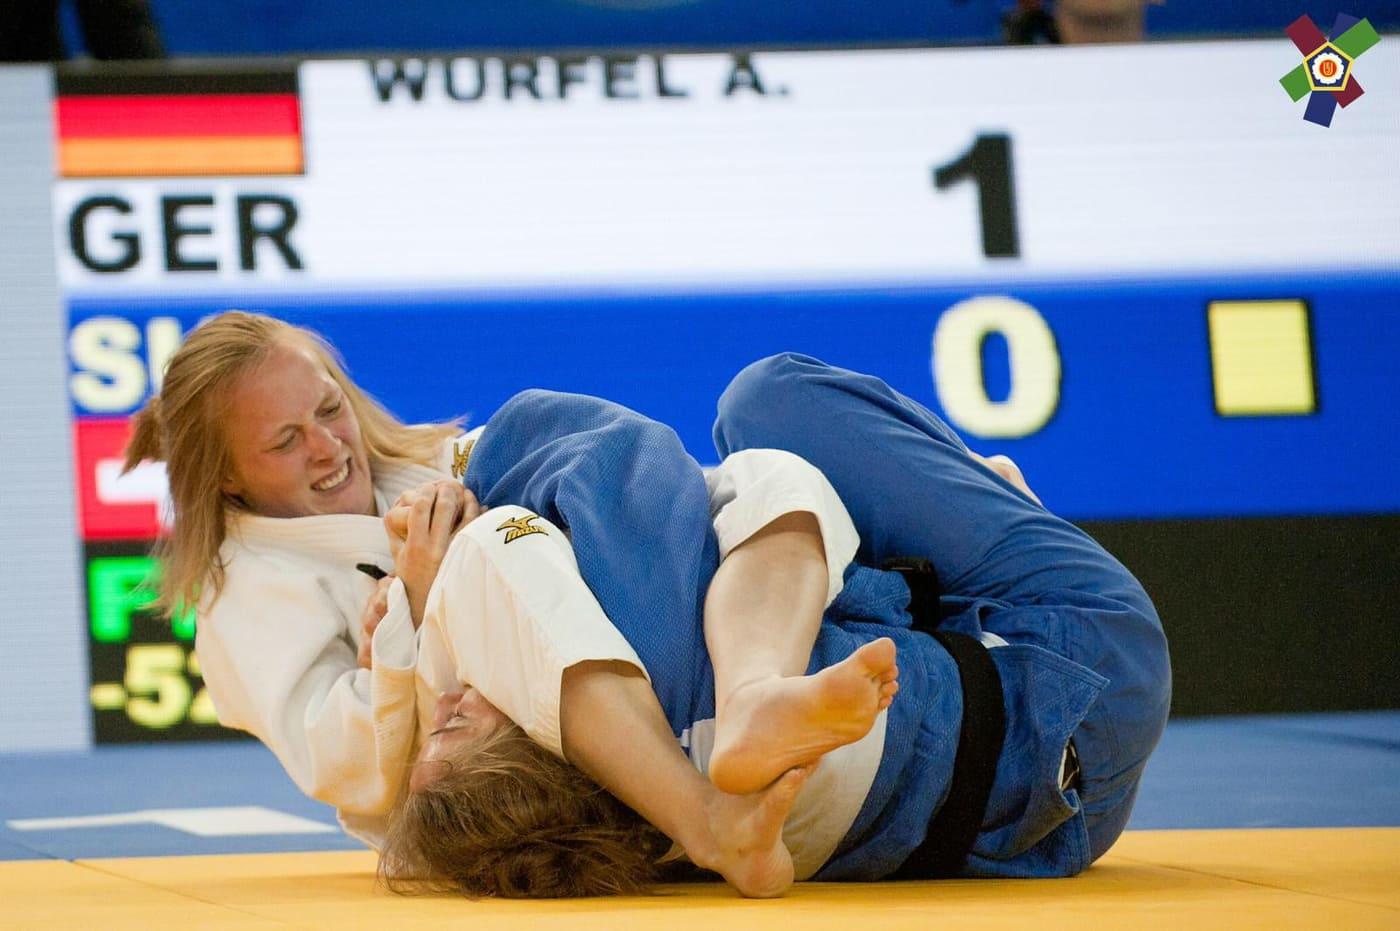 Annika Würfel startet bei U23 EM